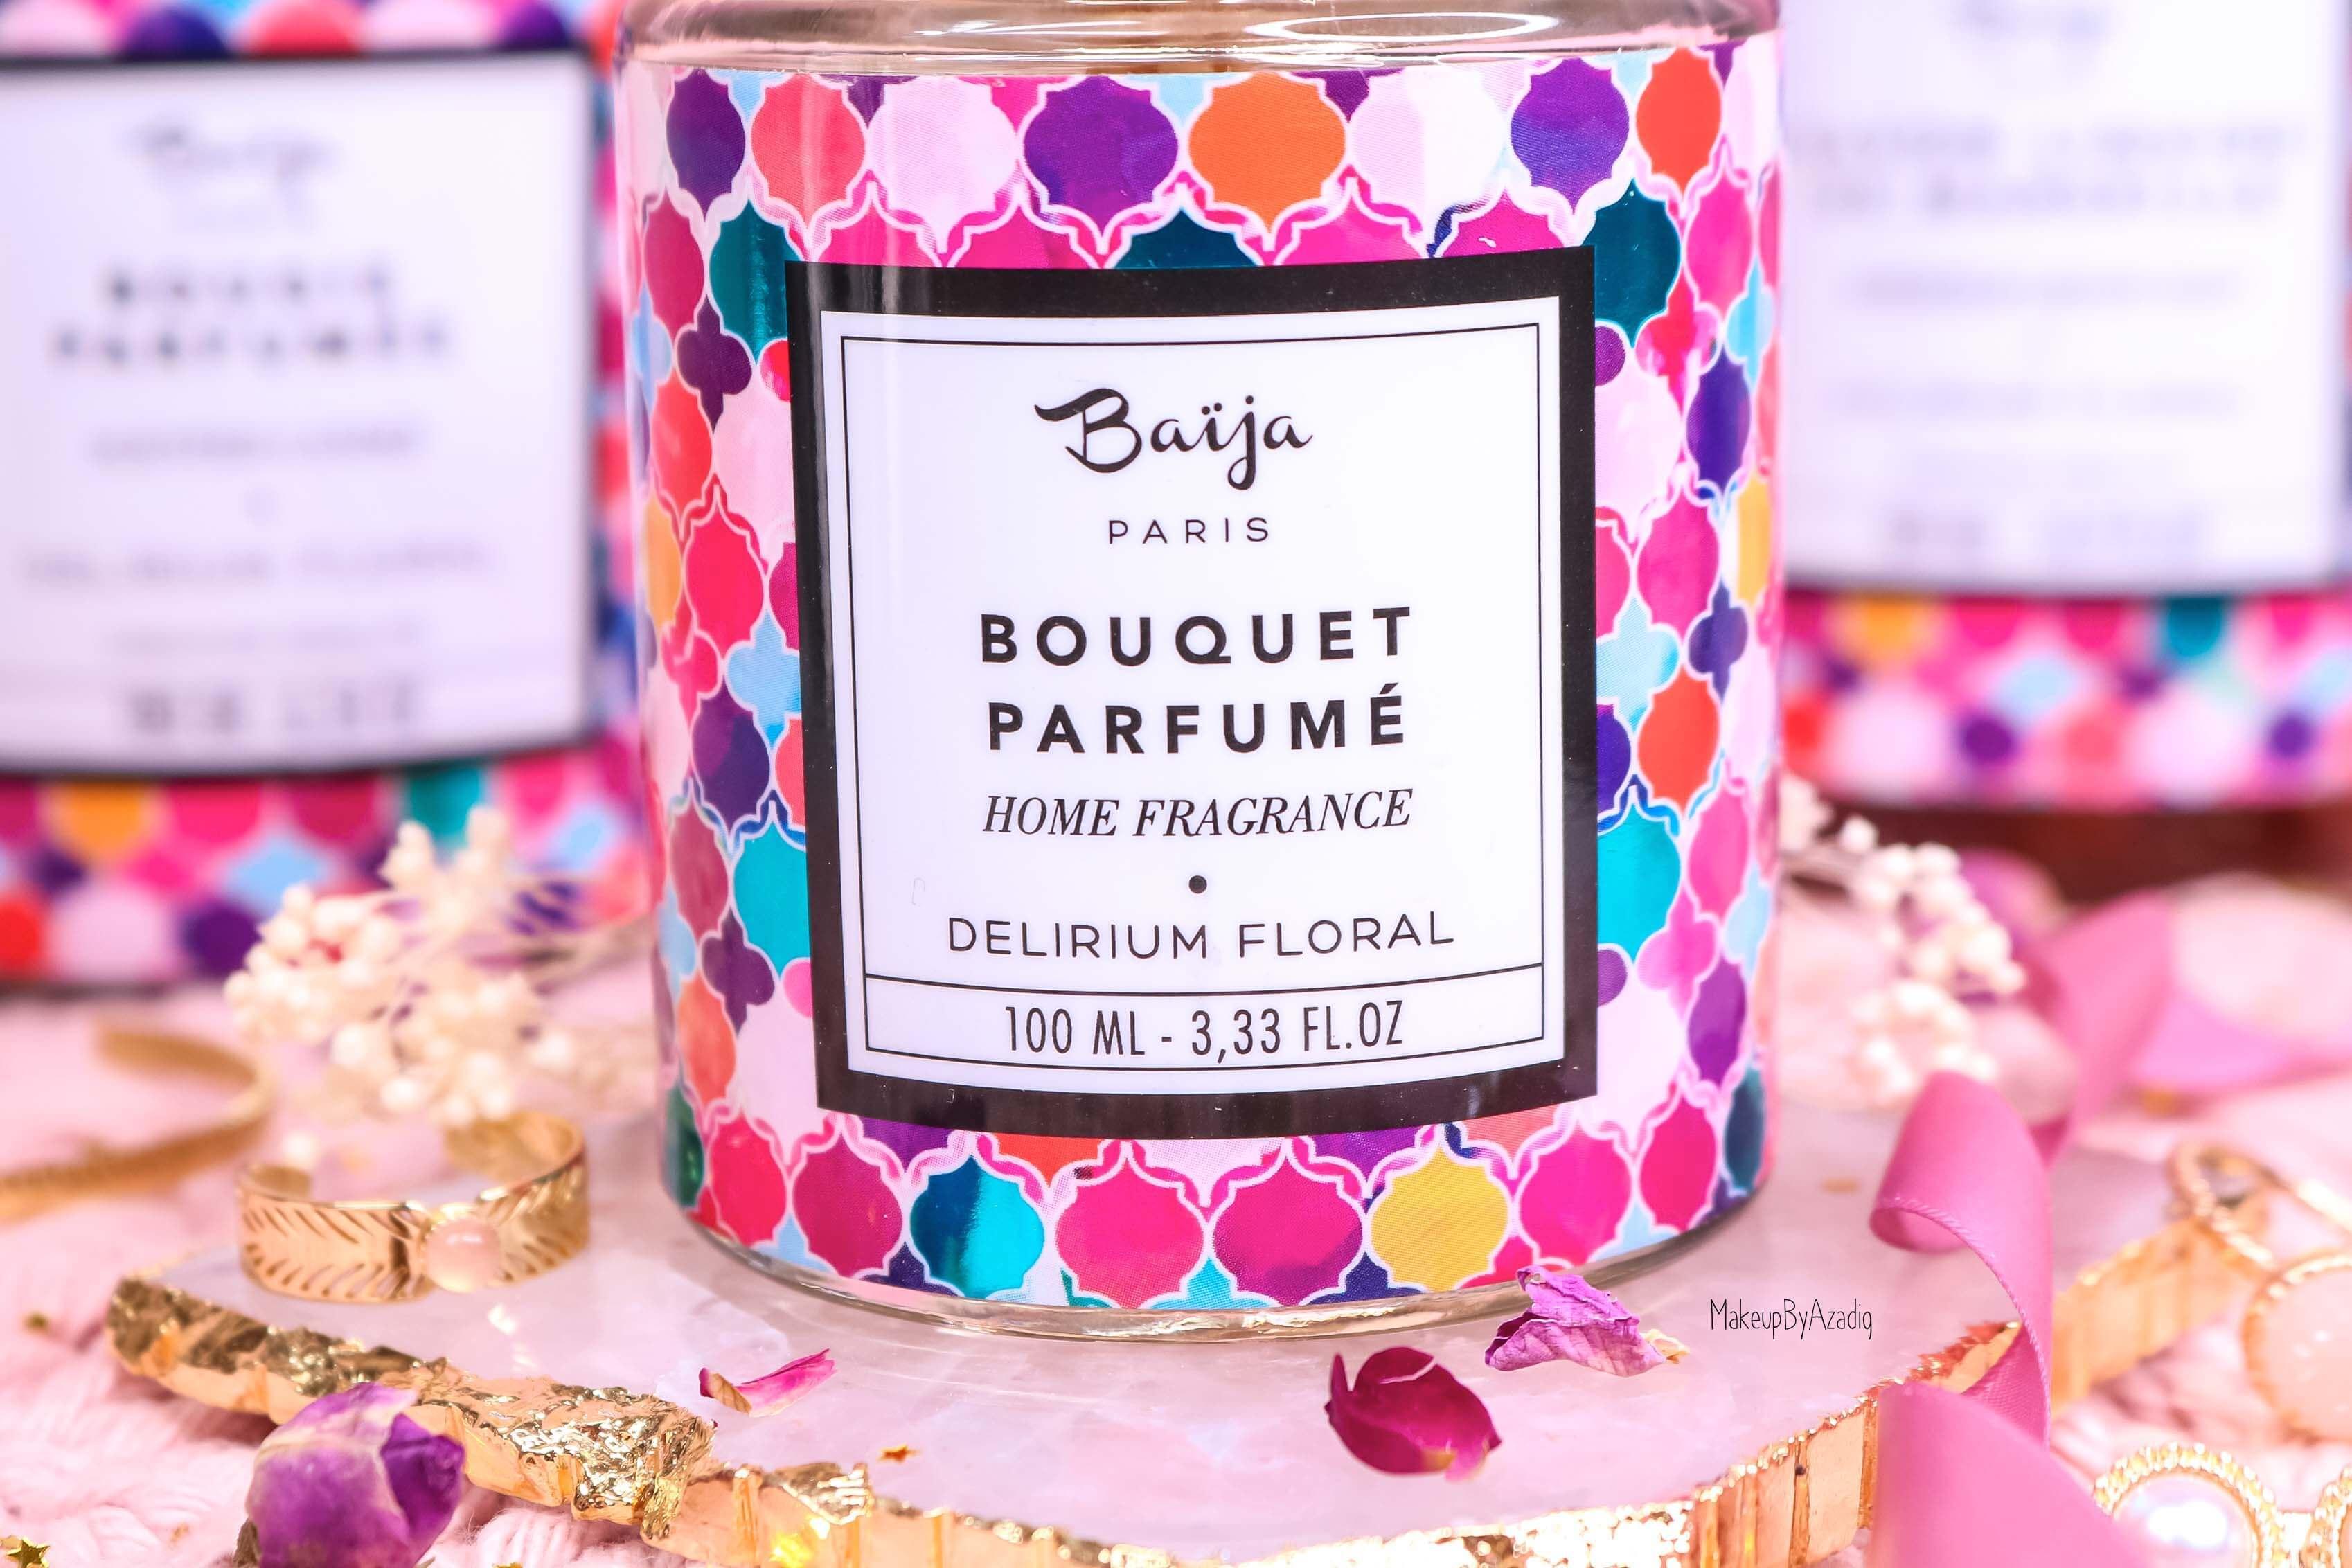 revue-collection-delirium-floral-baija-paris-corps-bougie-gommage-soin-fleurs-makeupbyazadig-avis-prix-sephora-fragrance